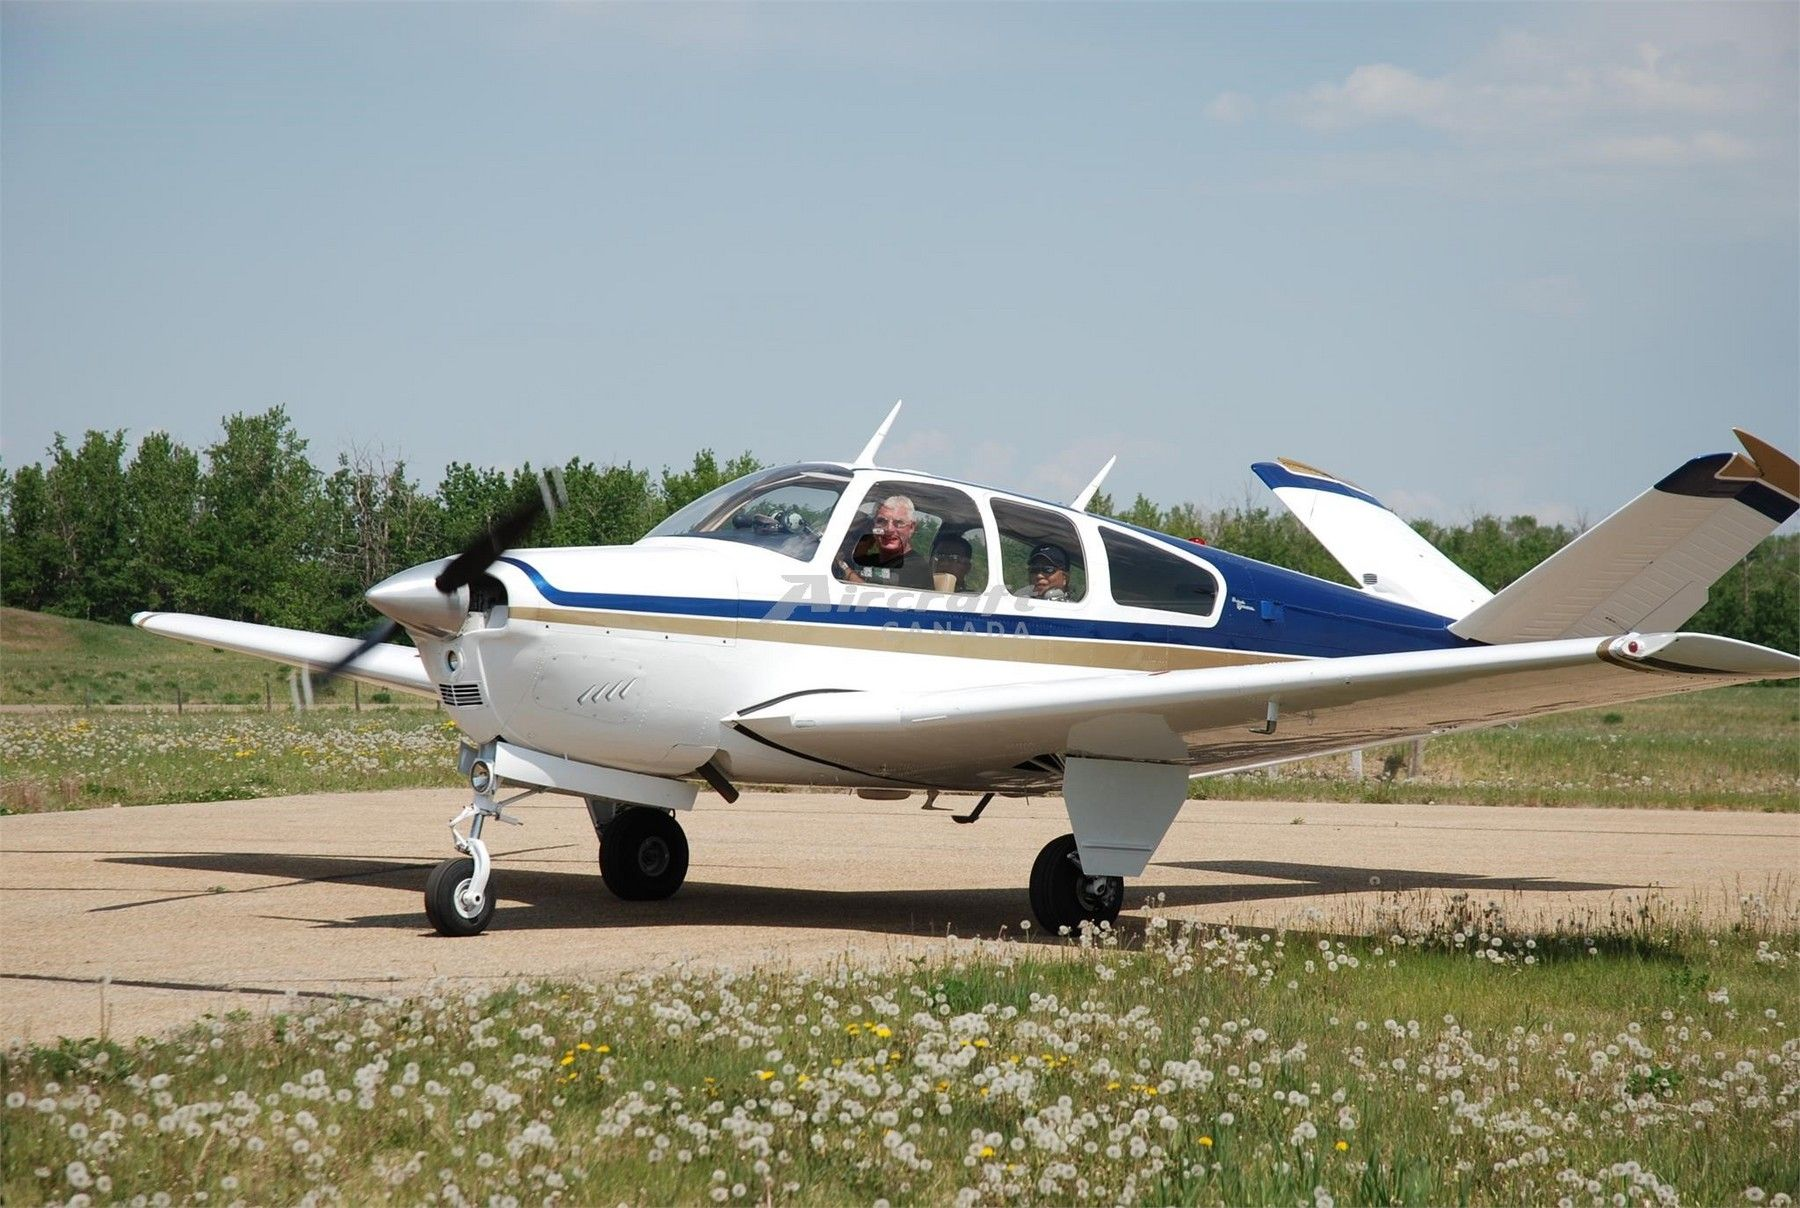 1966 Beechcraft Bonanza V35 for sale in Edmonton, AB